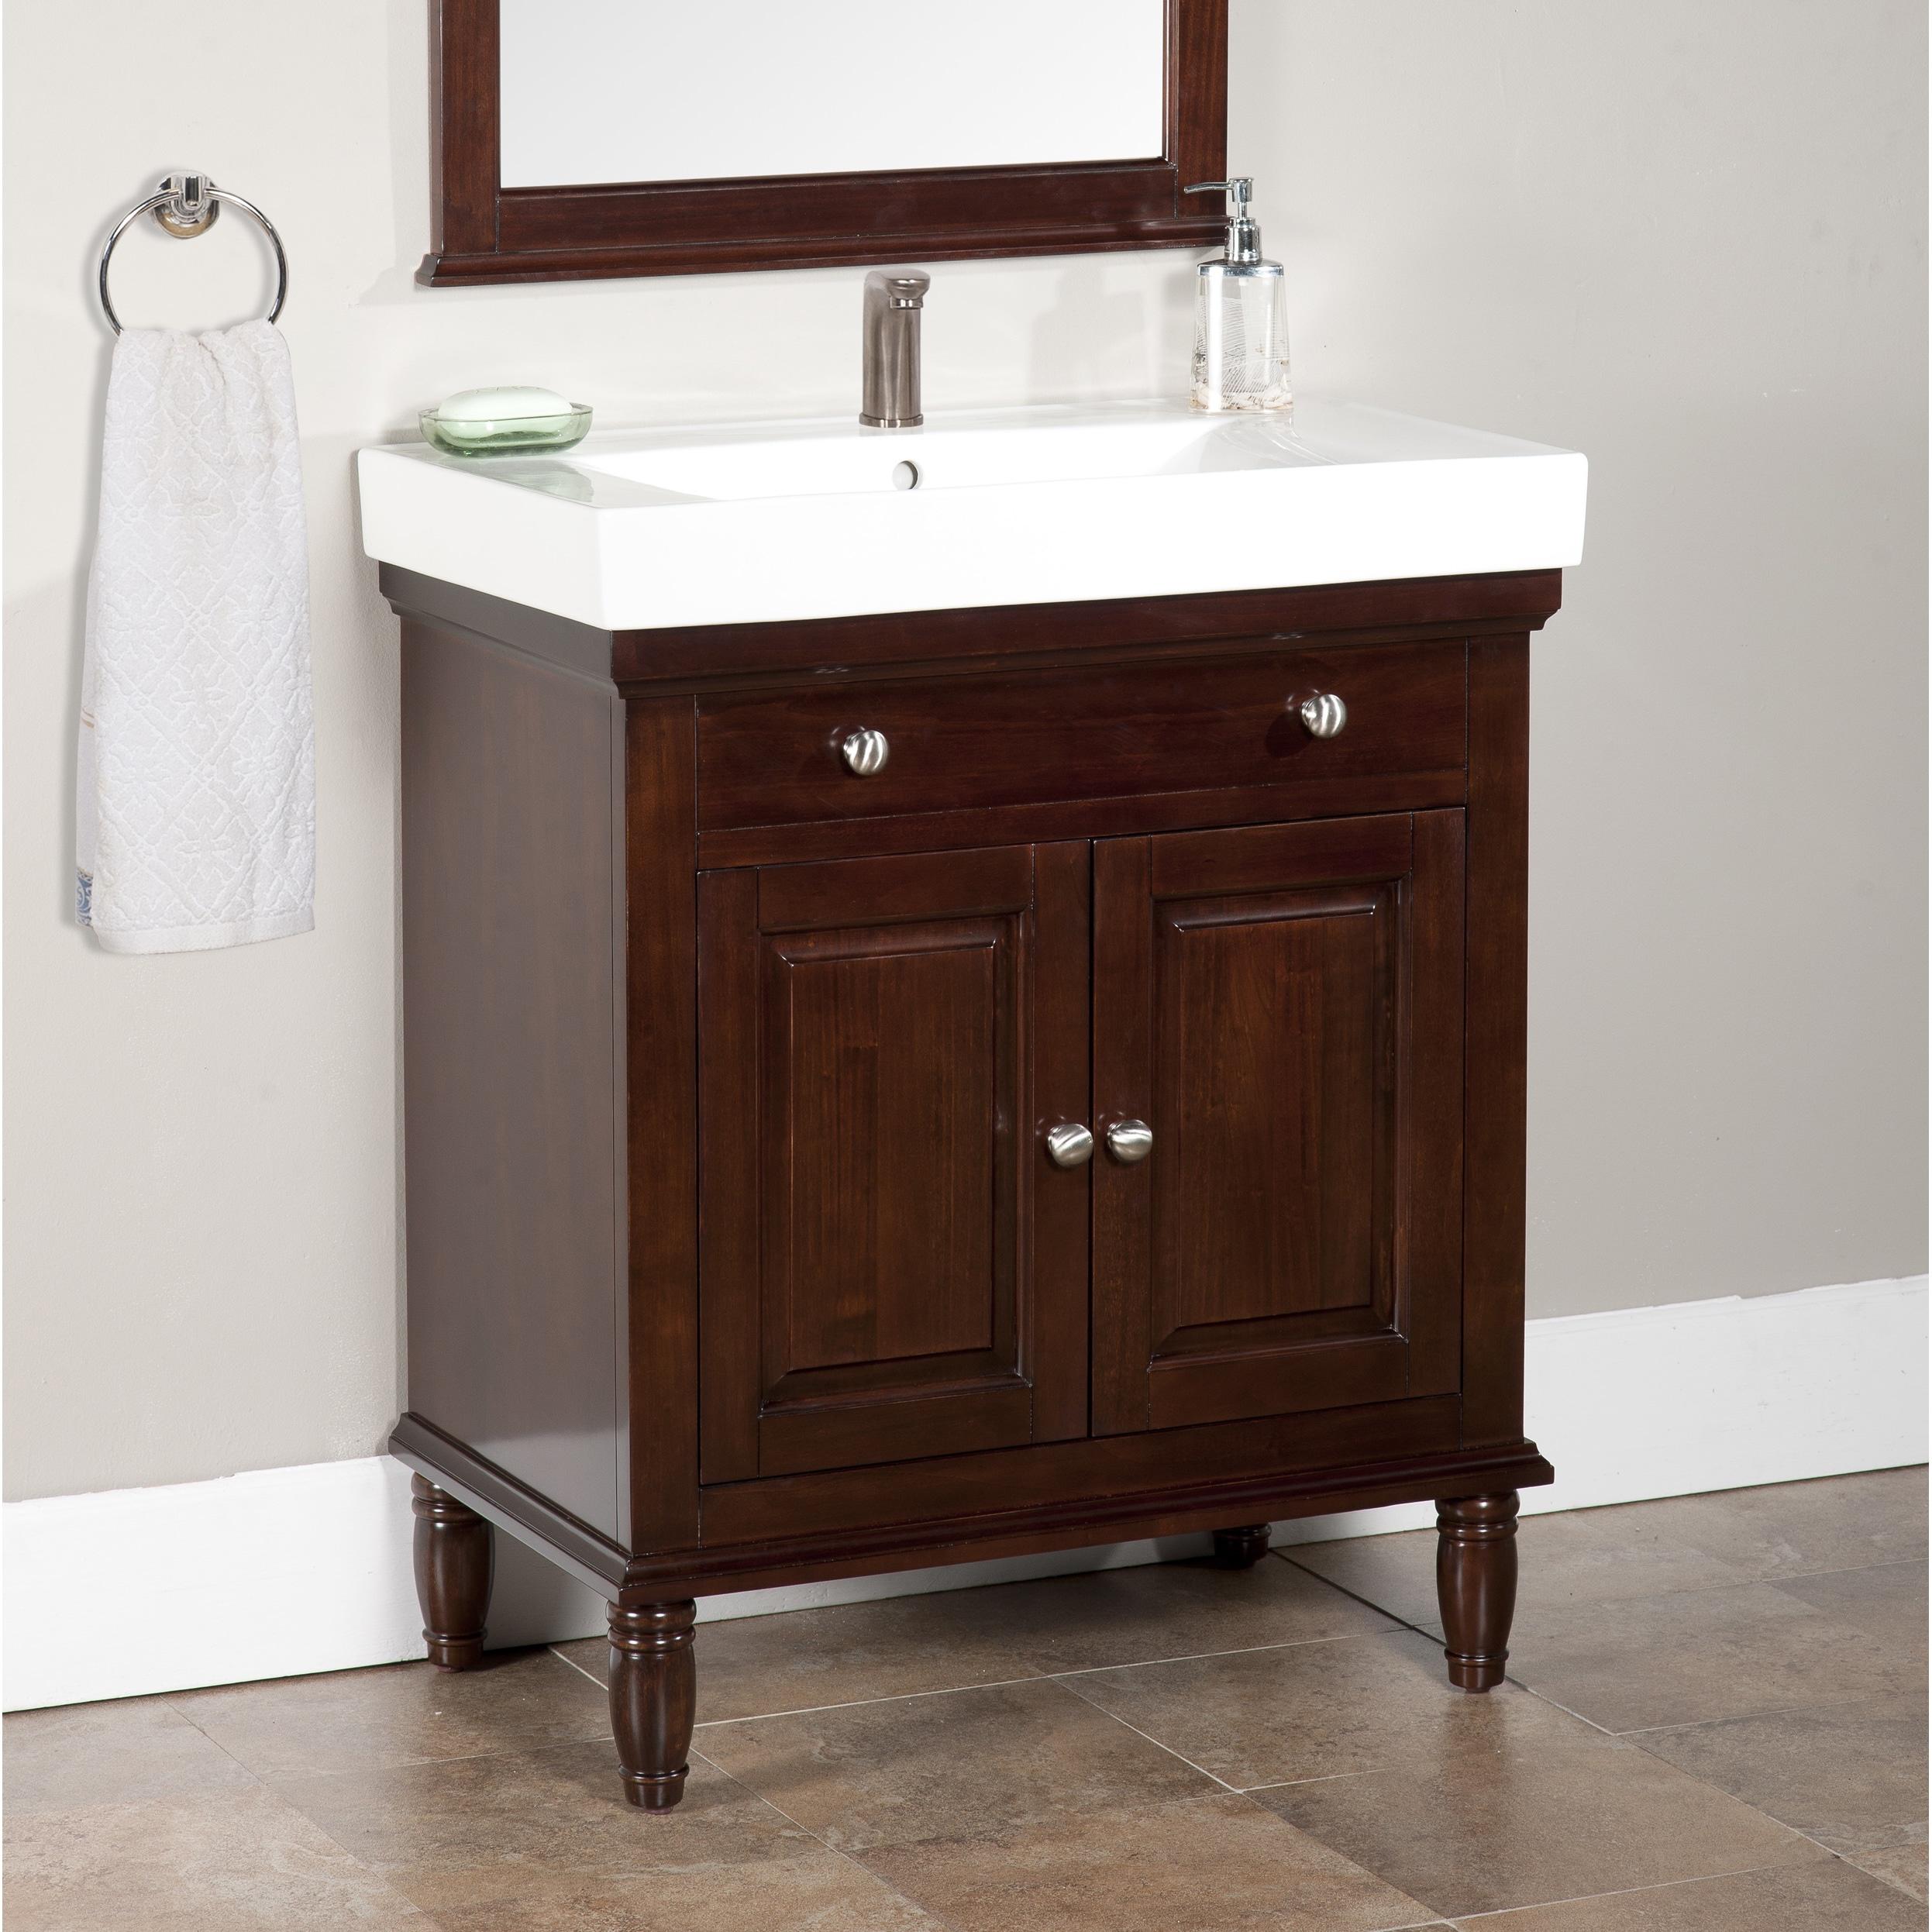 30 Inch Single Bathroom Vanity